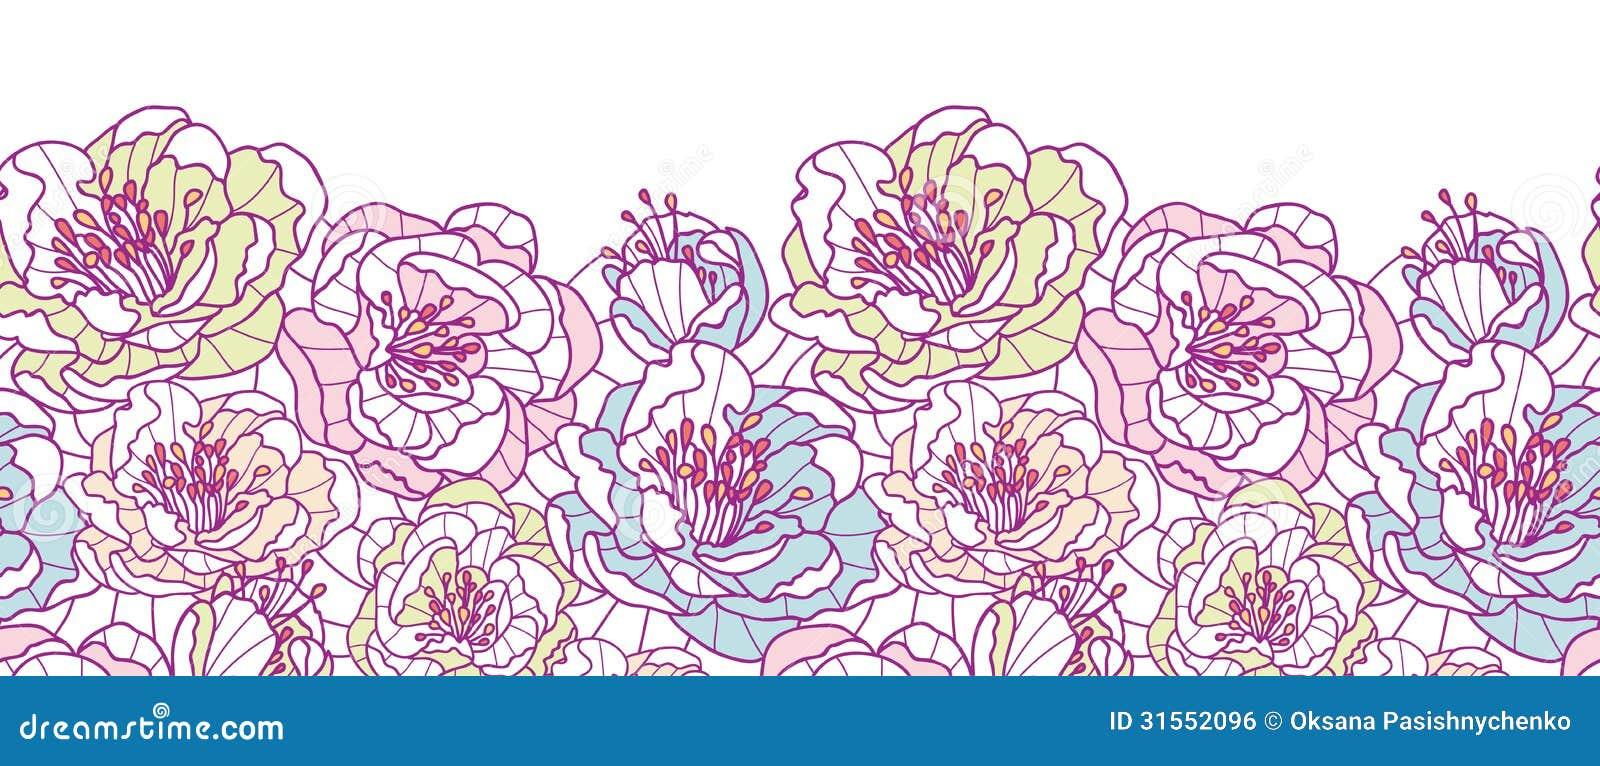 Line Art Flower Background : Colorful line art flowers horizontal seamless stock vector